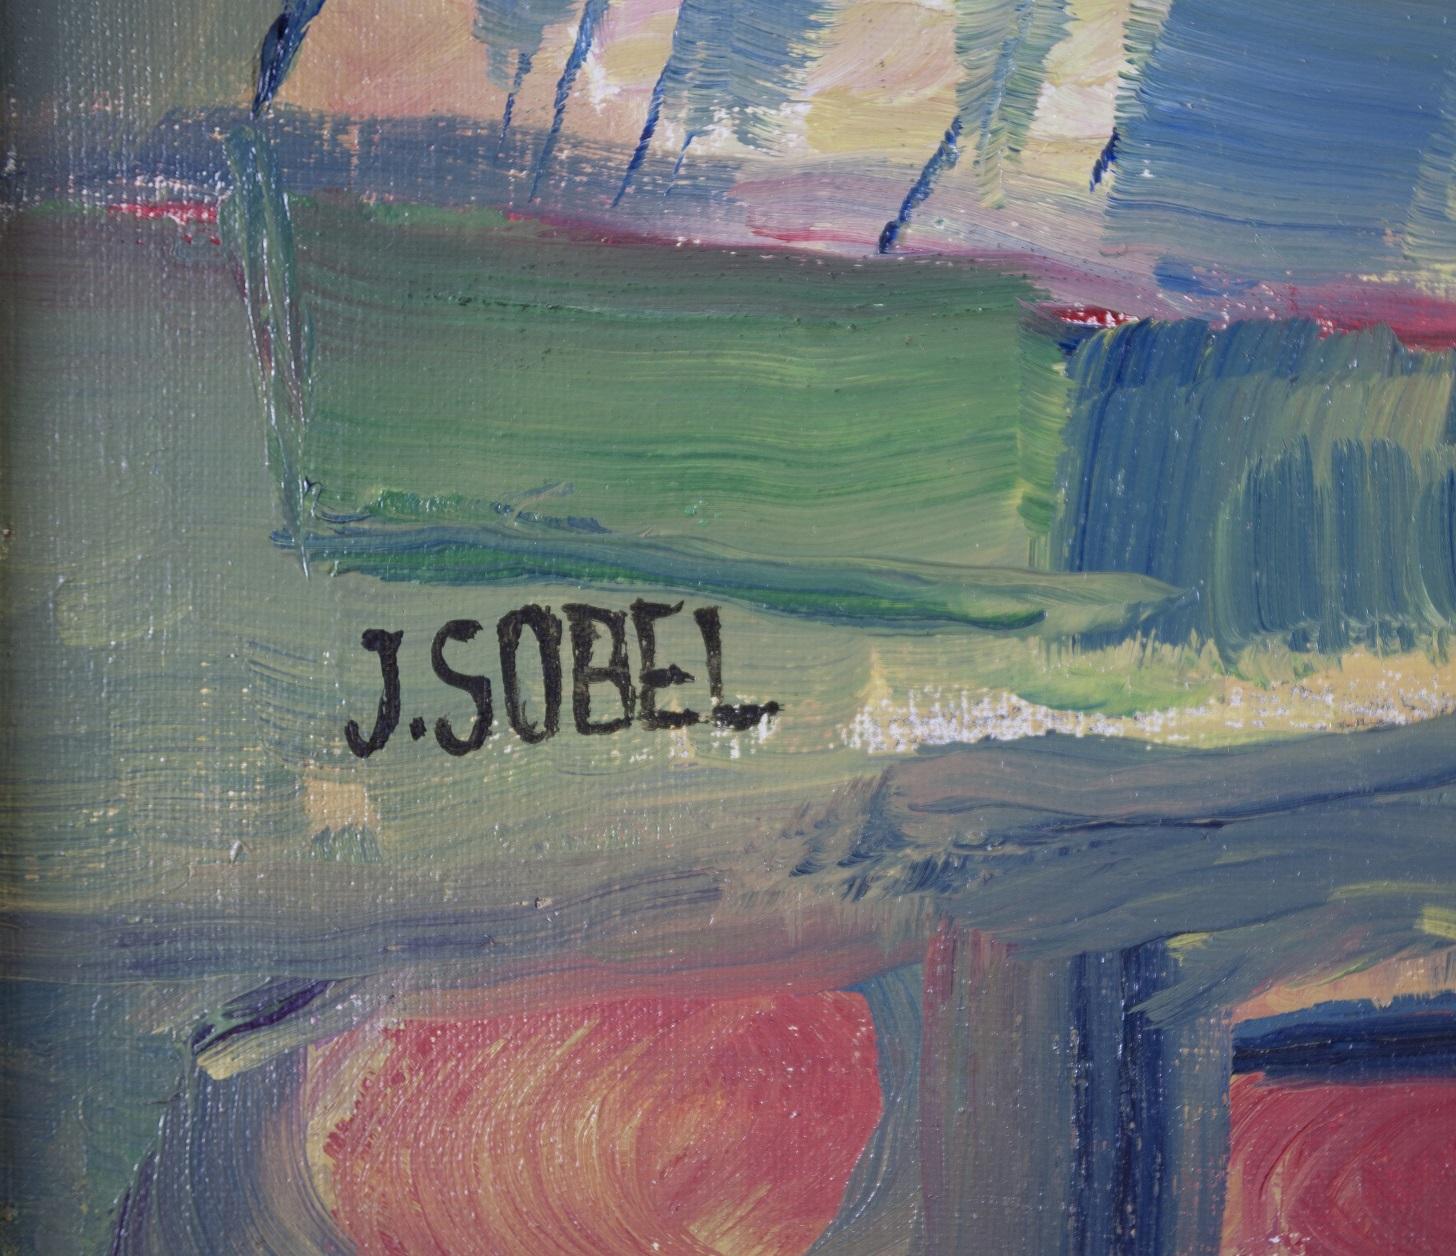 Sobel Judyta (1924-2012), Martwa natura